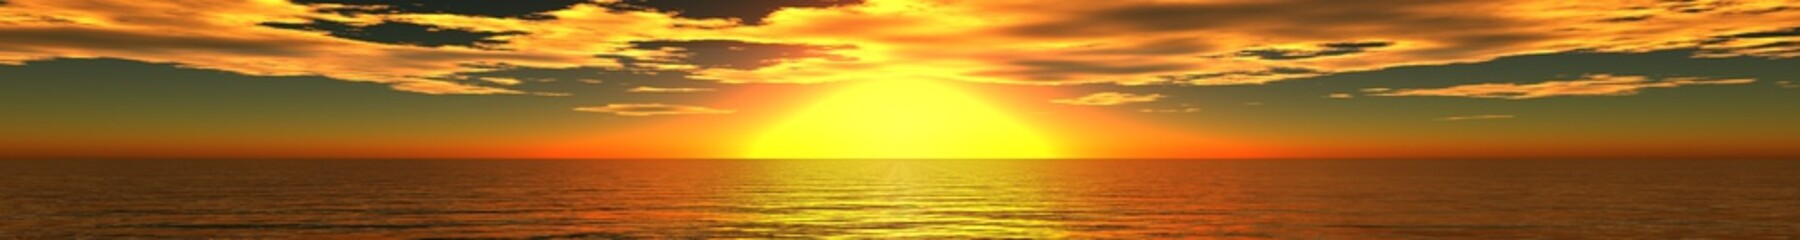 Fototapeta panorama zachód słońca nad morzem